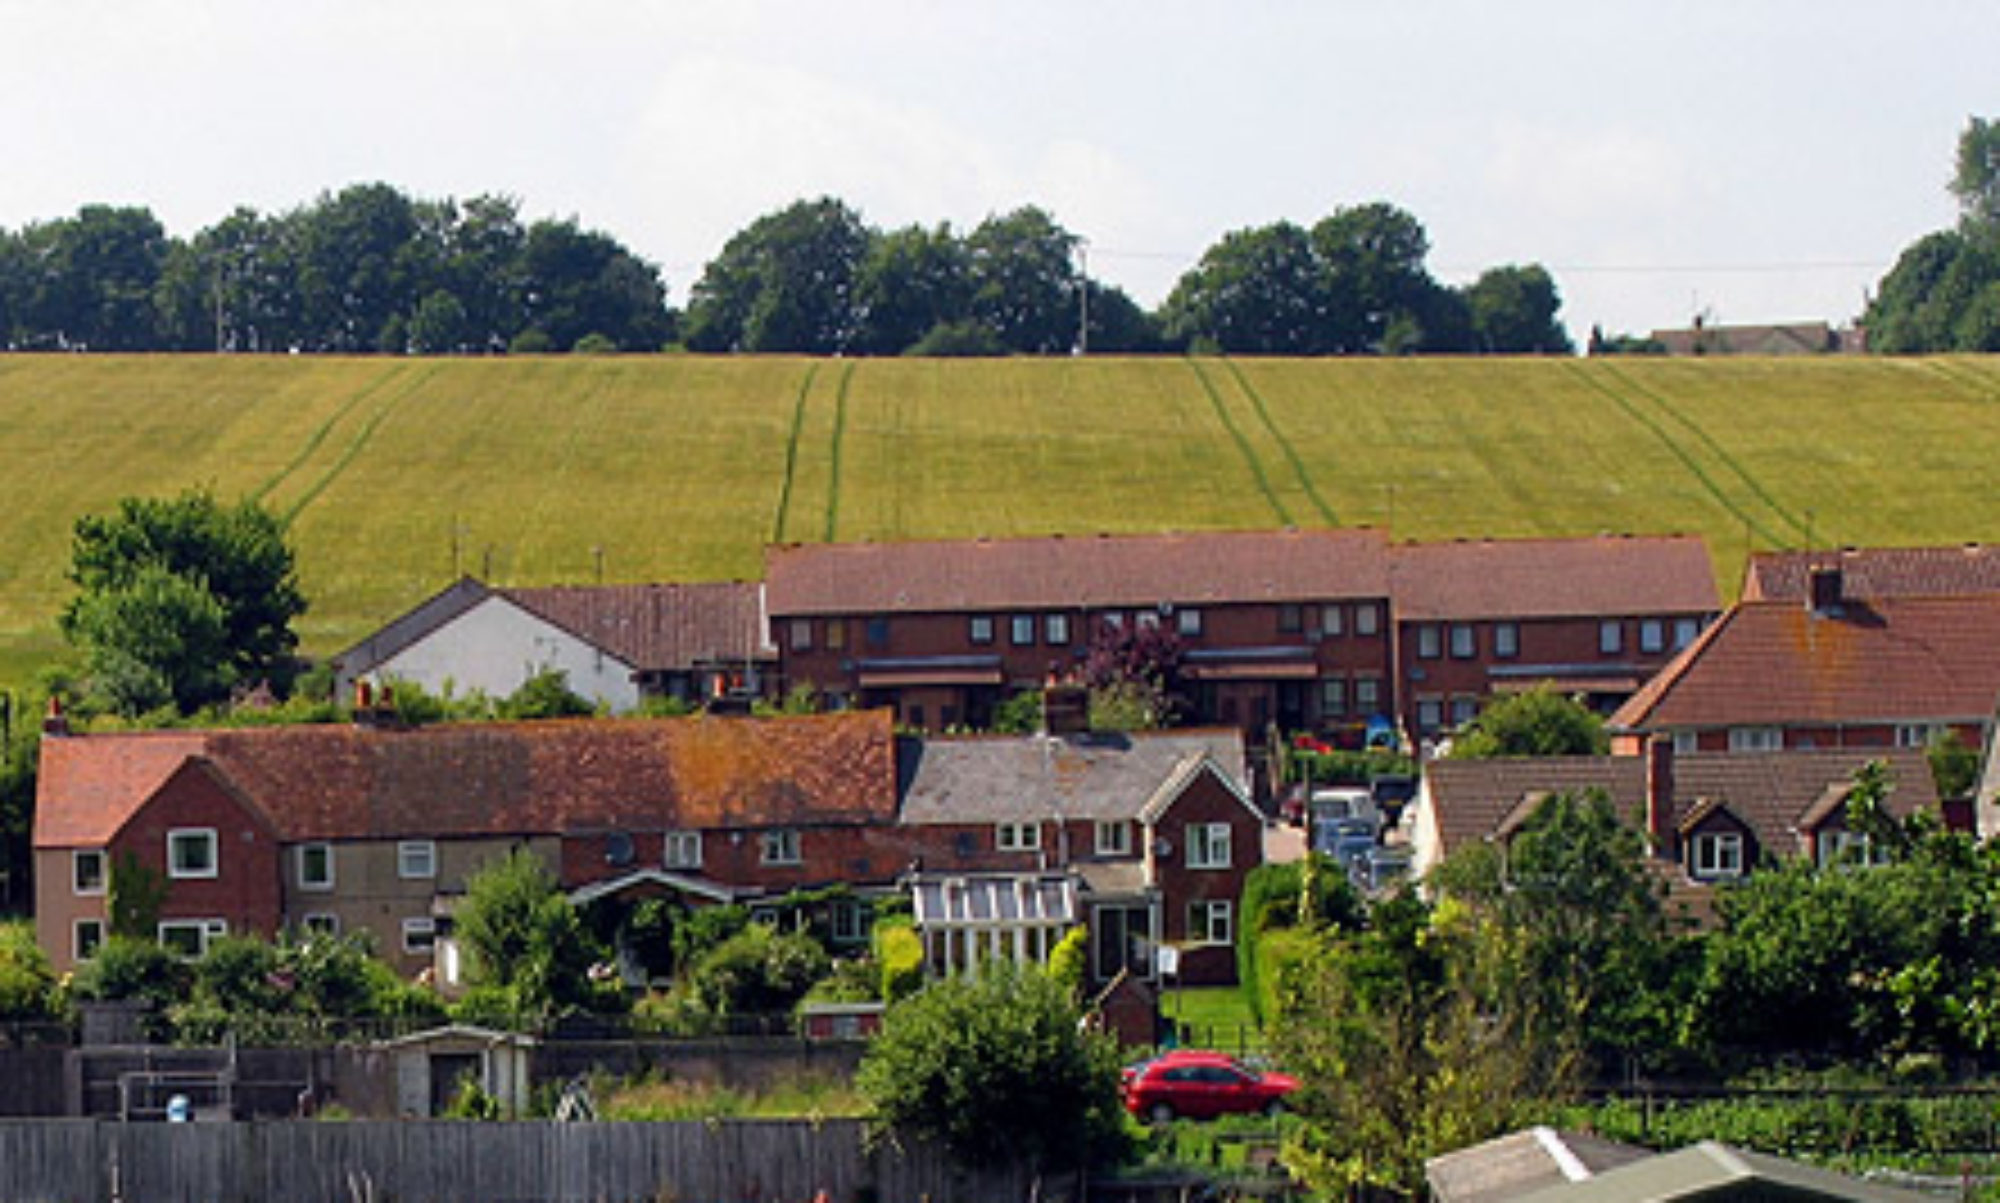 Canal Porno Ama De Casa Chantage the_rural_village_of_lambourn_-_geograph.uk_-_25913